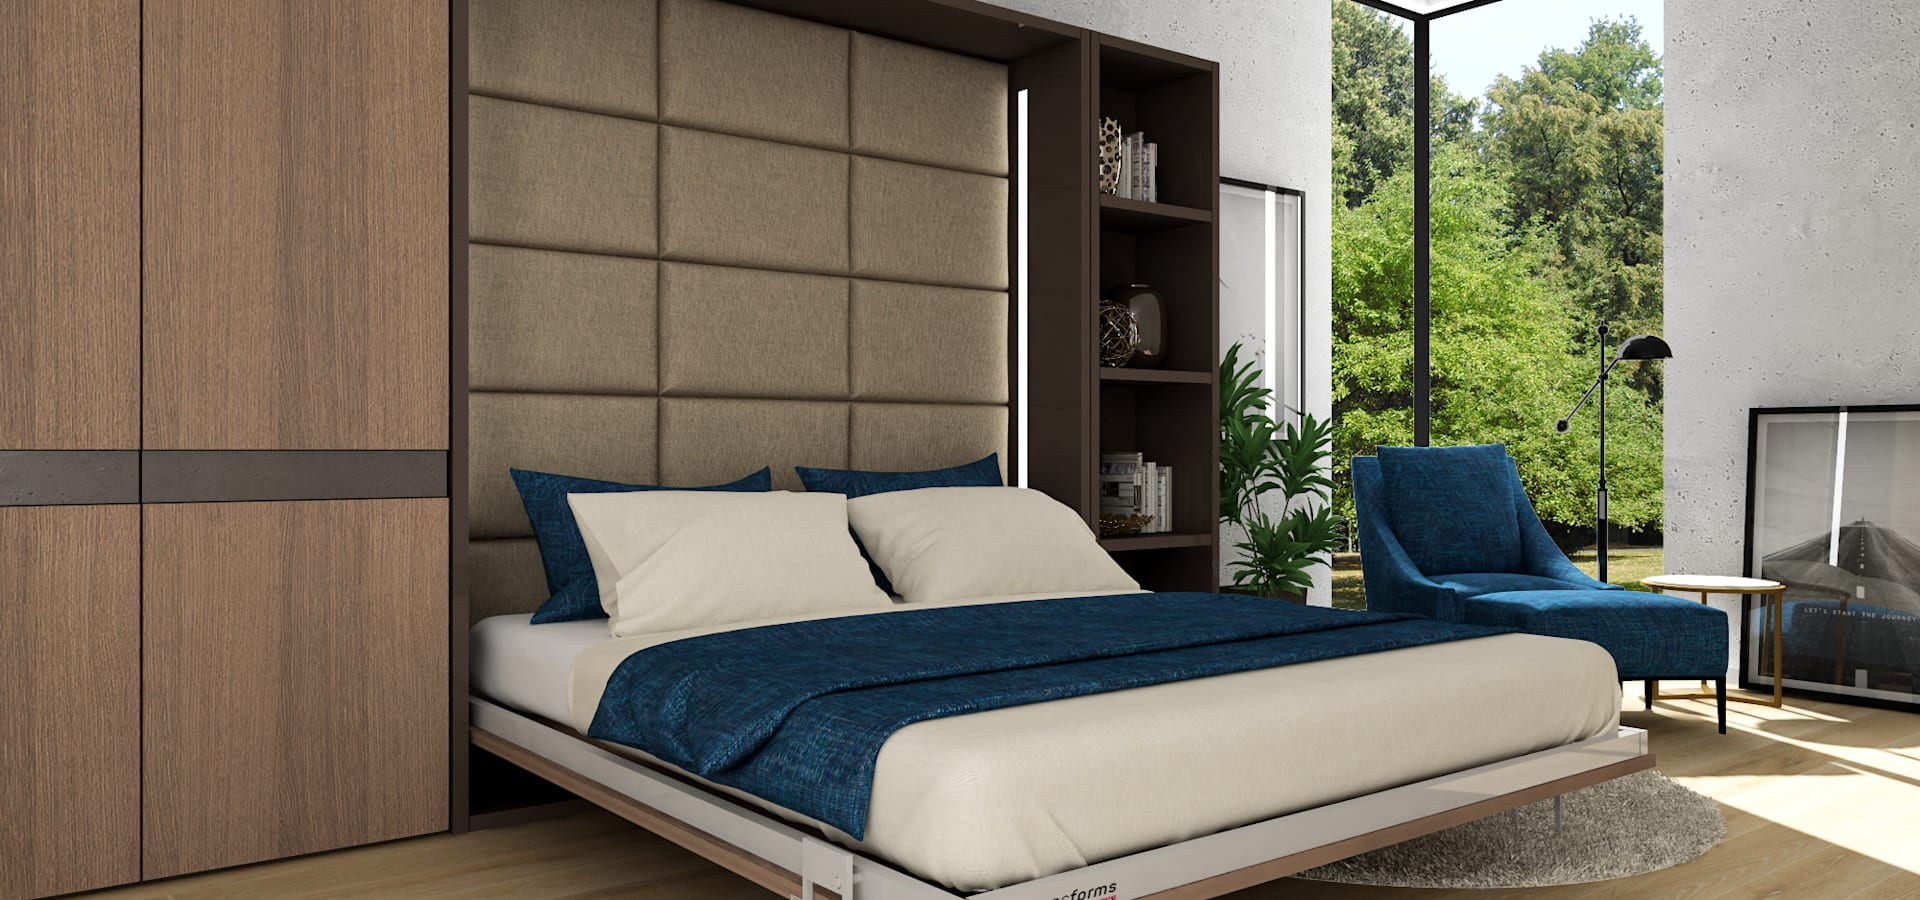 Transforms Smart Beds